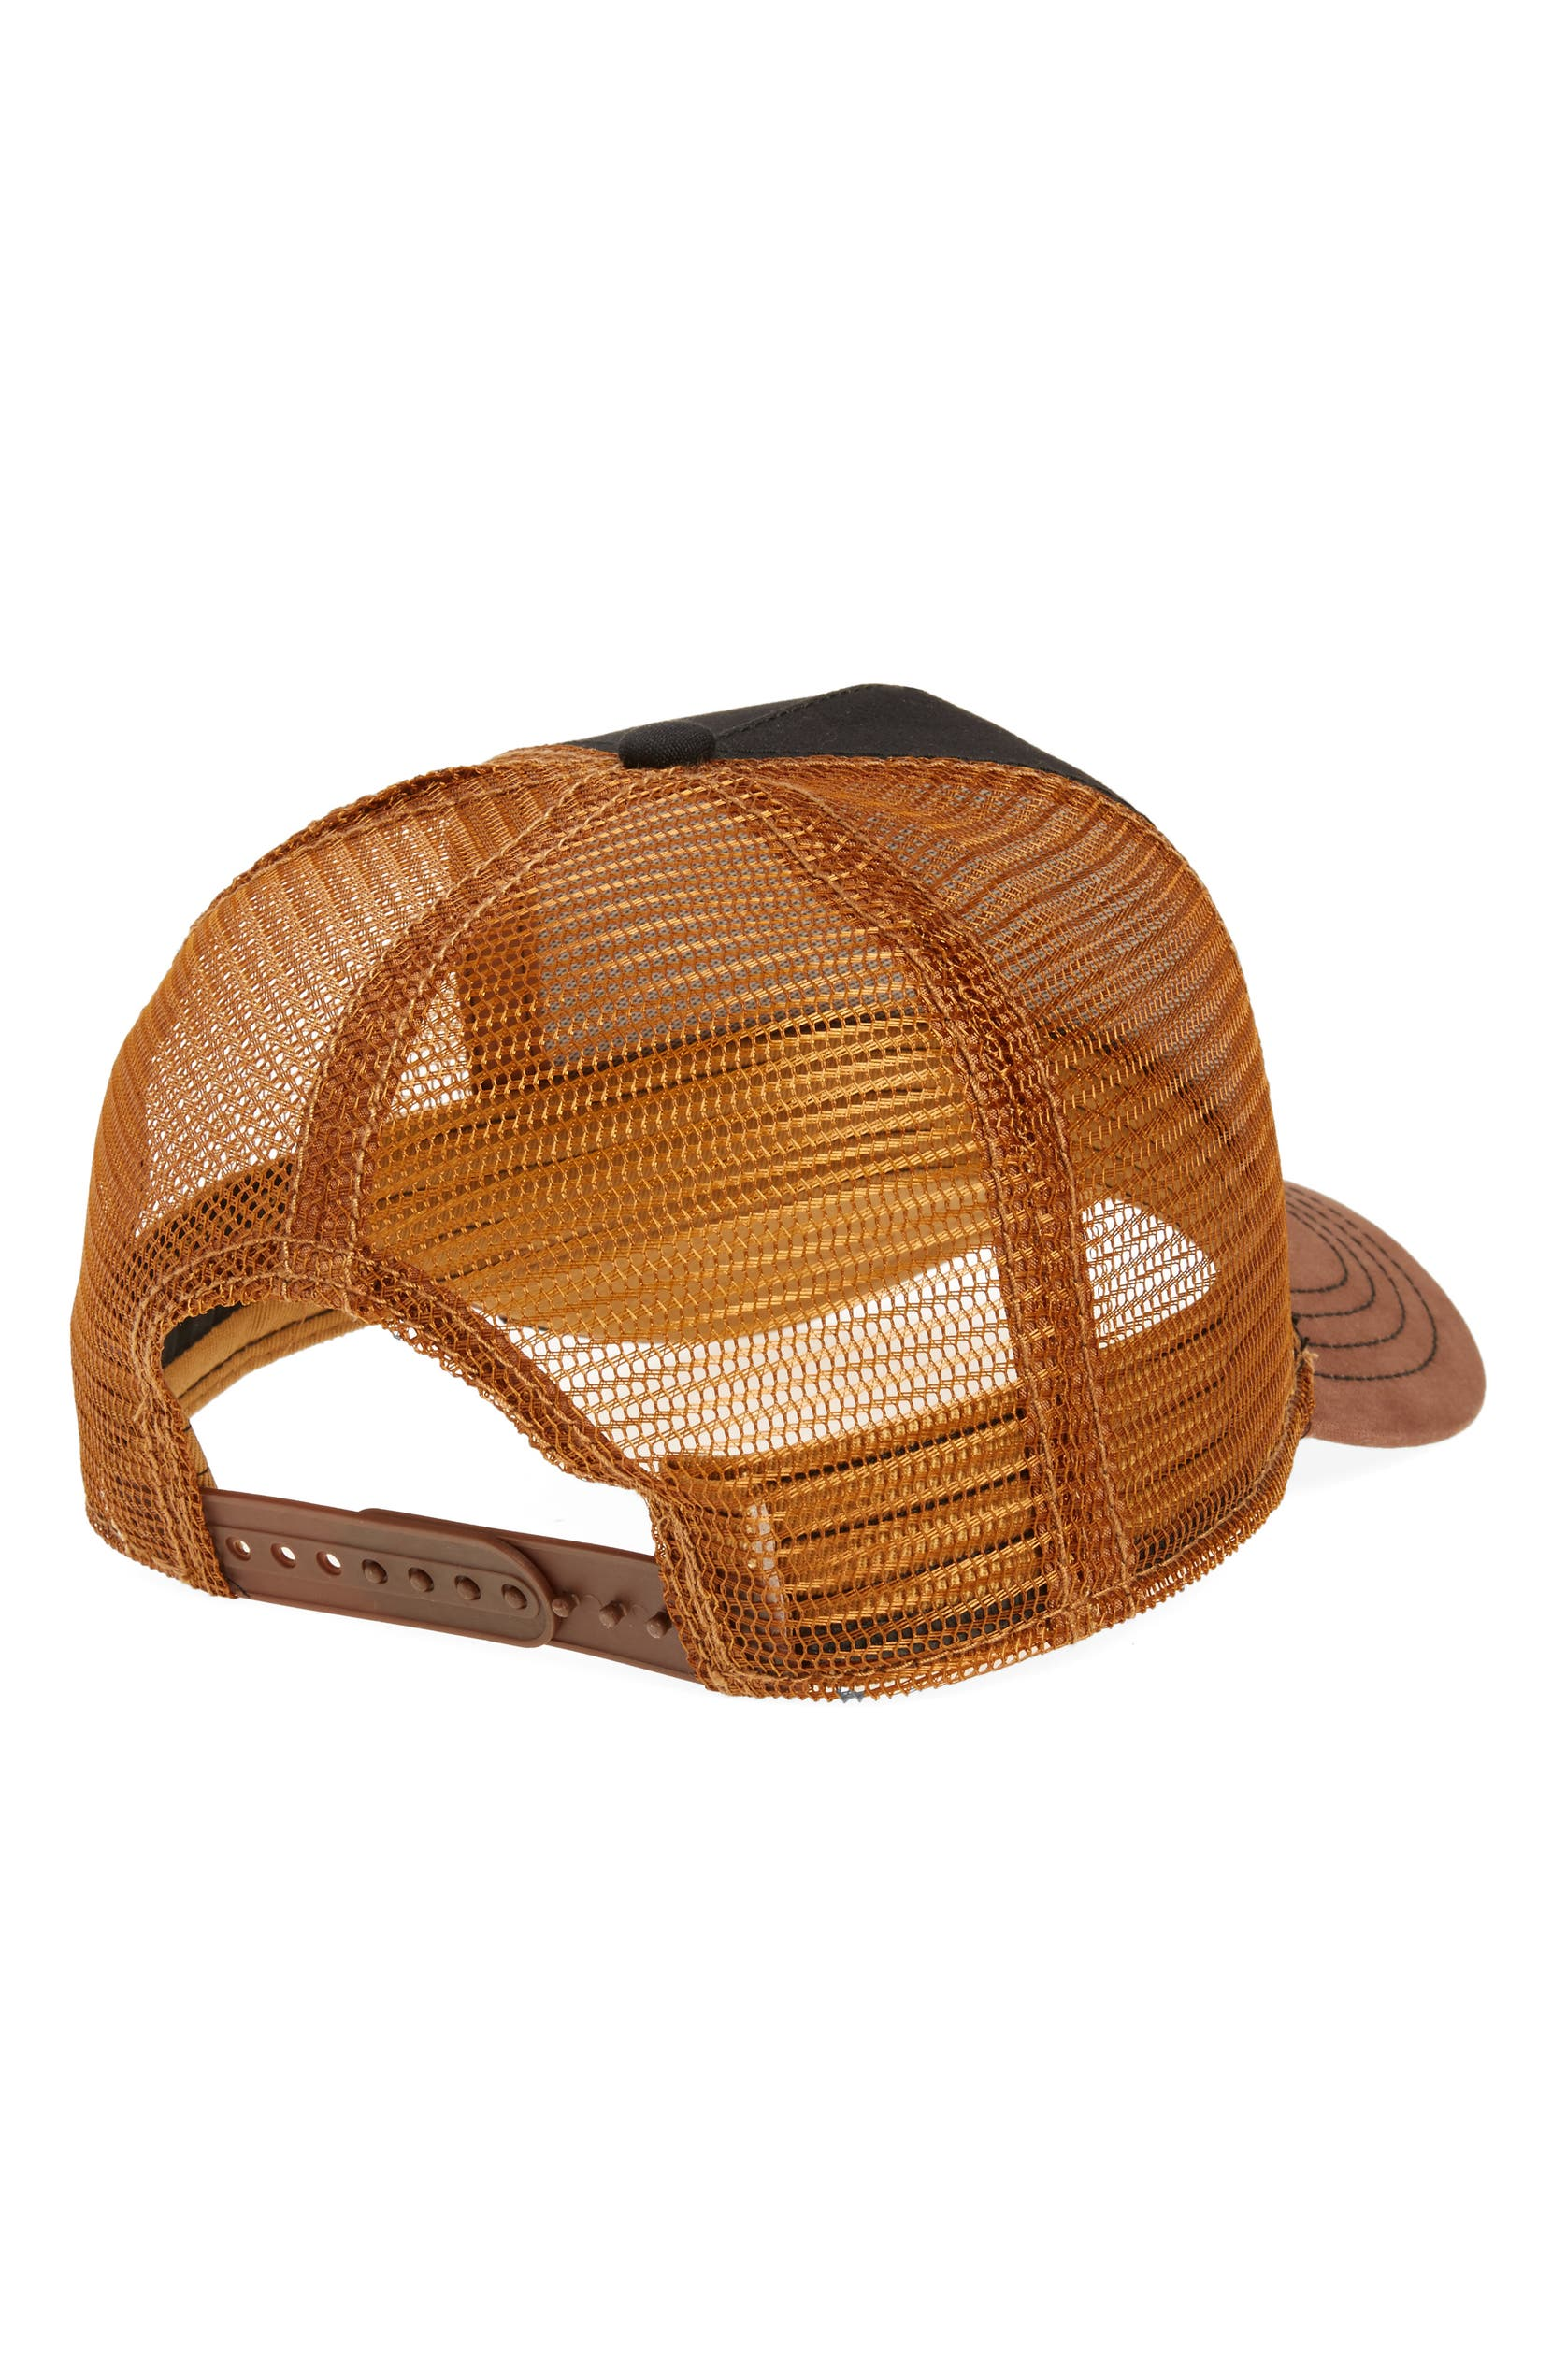 6145ea83 Goorin Bros. Barnyard Donkey Trucker Hat | Nordstrom